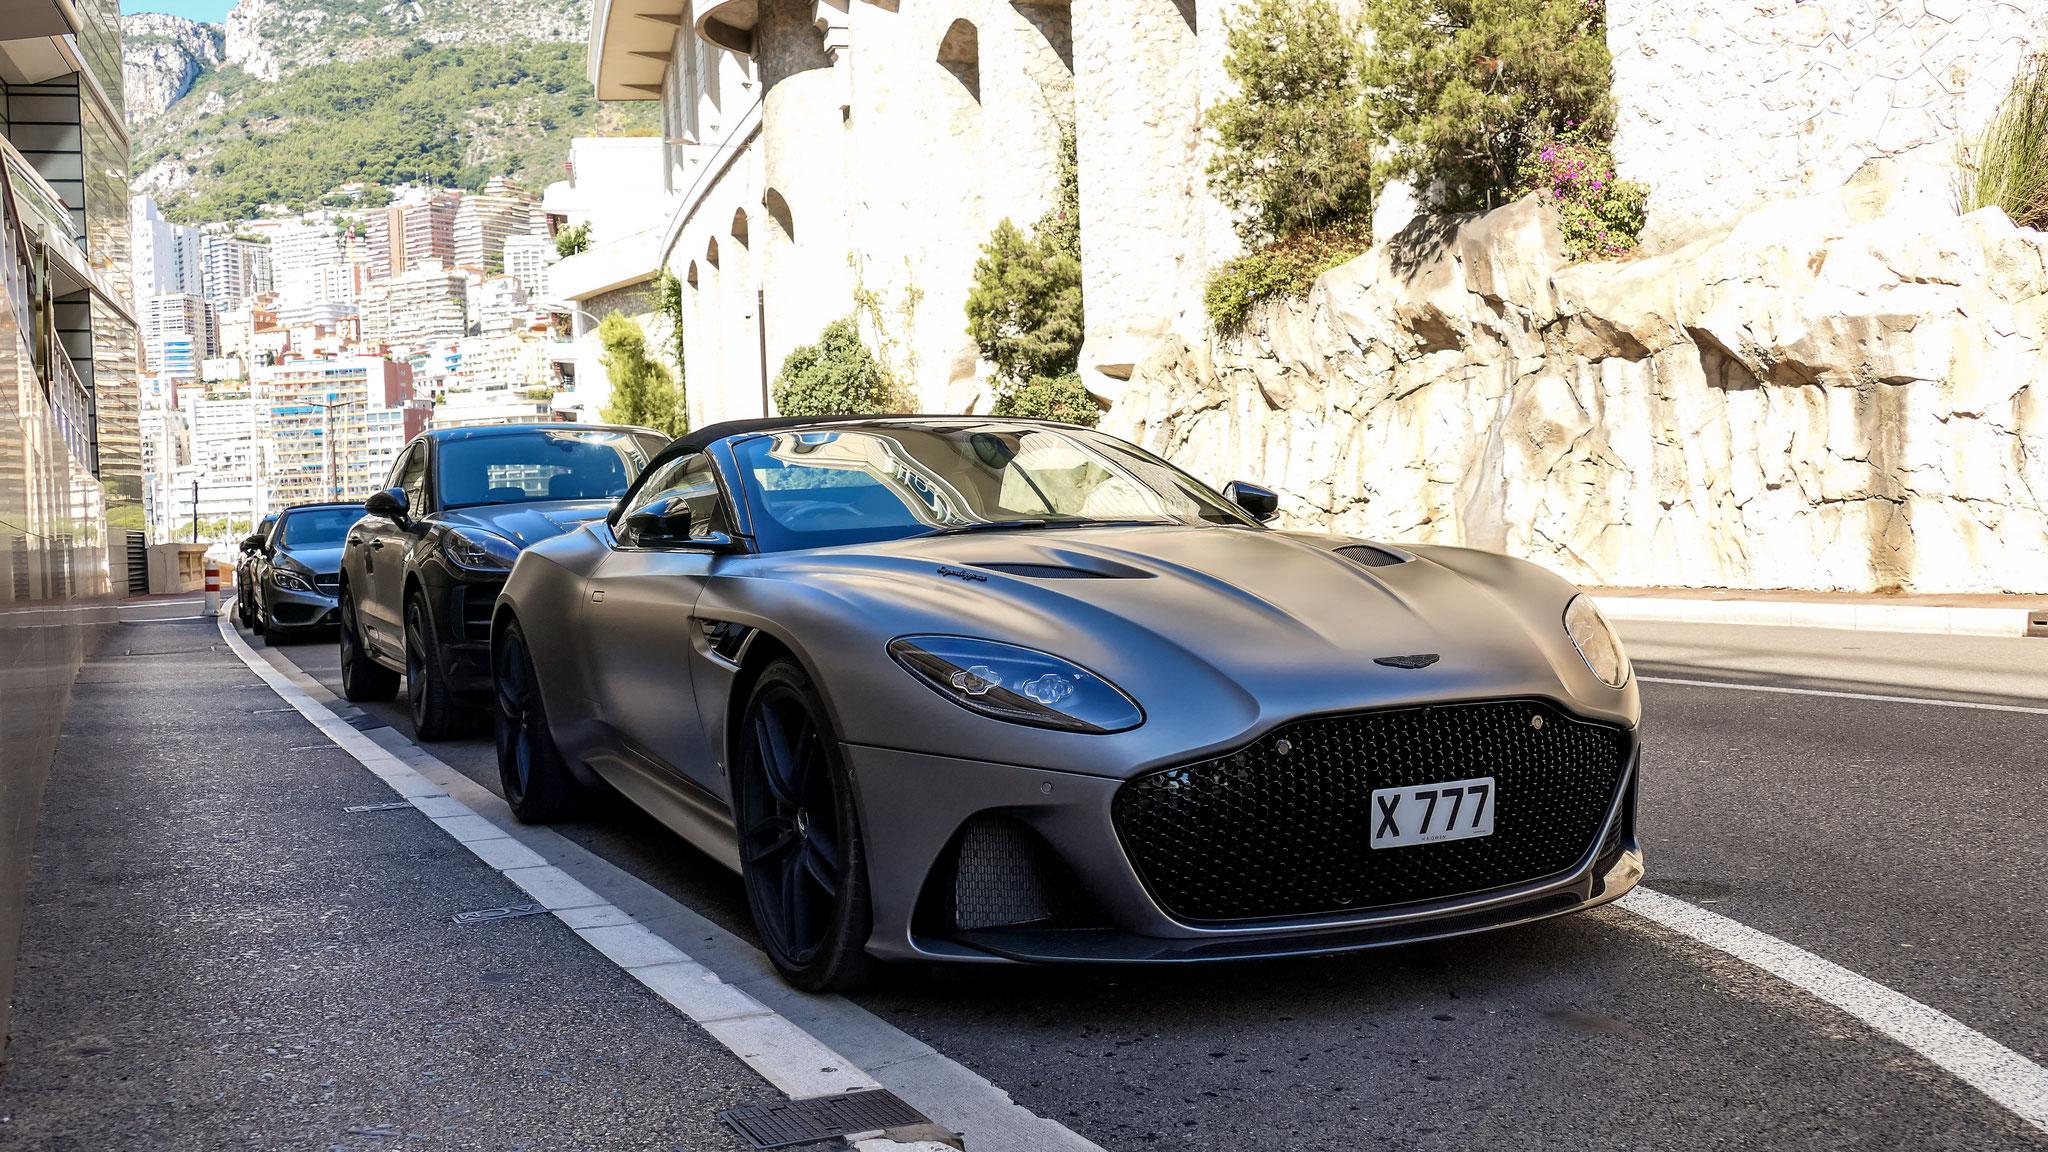 Aston Martin Carspotting Car Photography In Munich